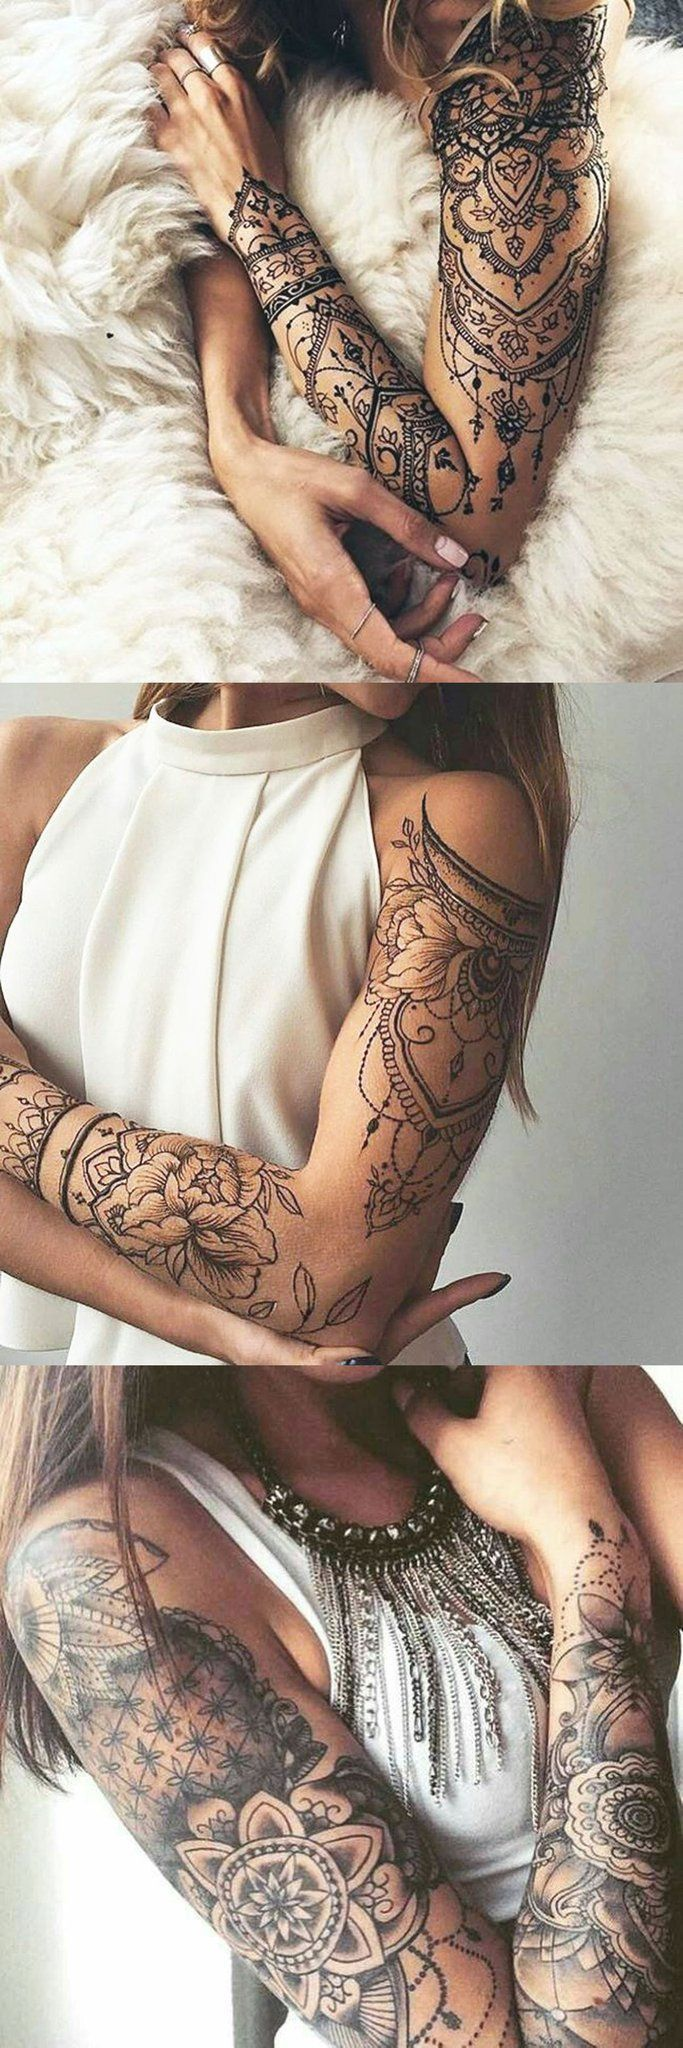 , Lotus Arm Sleeve Tattoo Ideas for Women at MyBodiArt.com – Tribal Mandala Arm Bi… More imagram.online, My Tattoo Blog 2020, My Tattoo Blog 2020